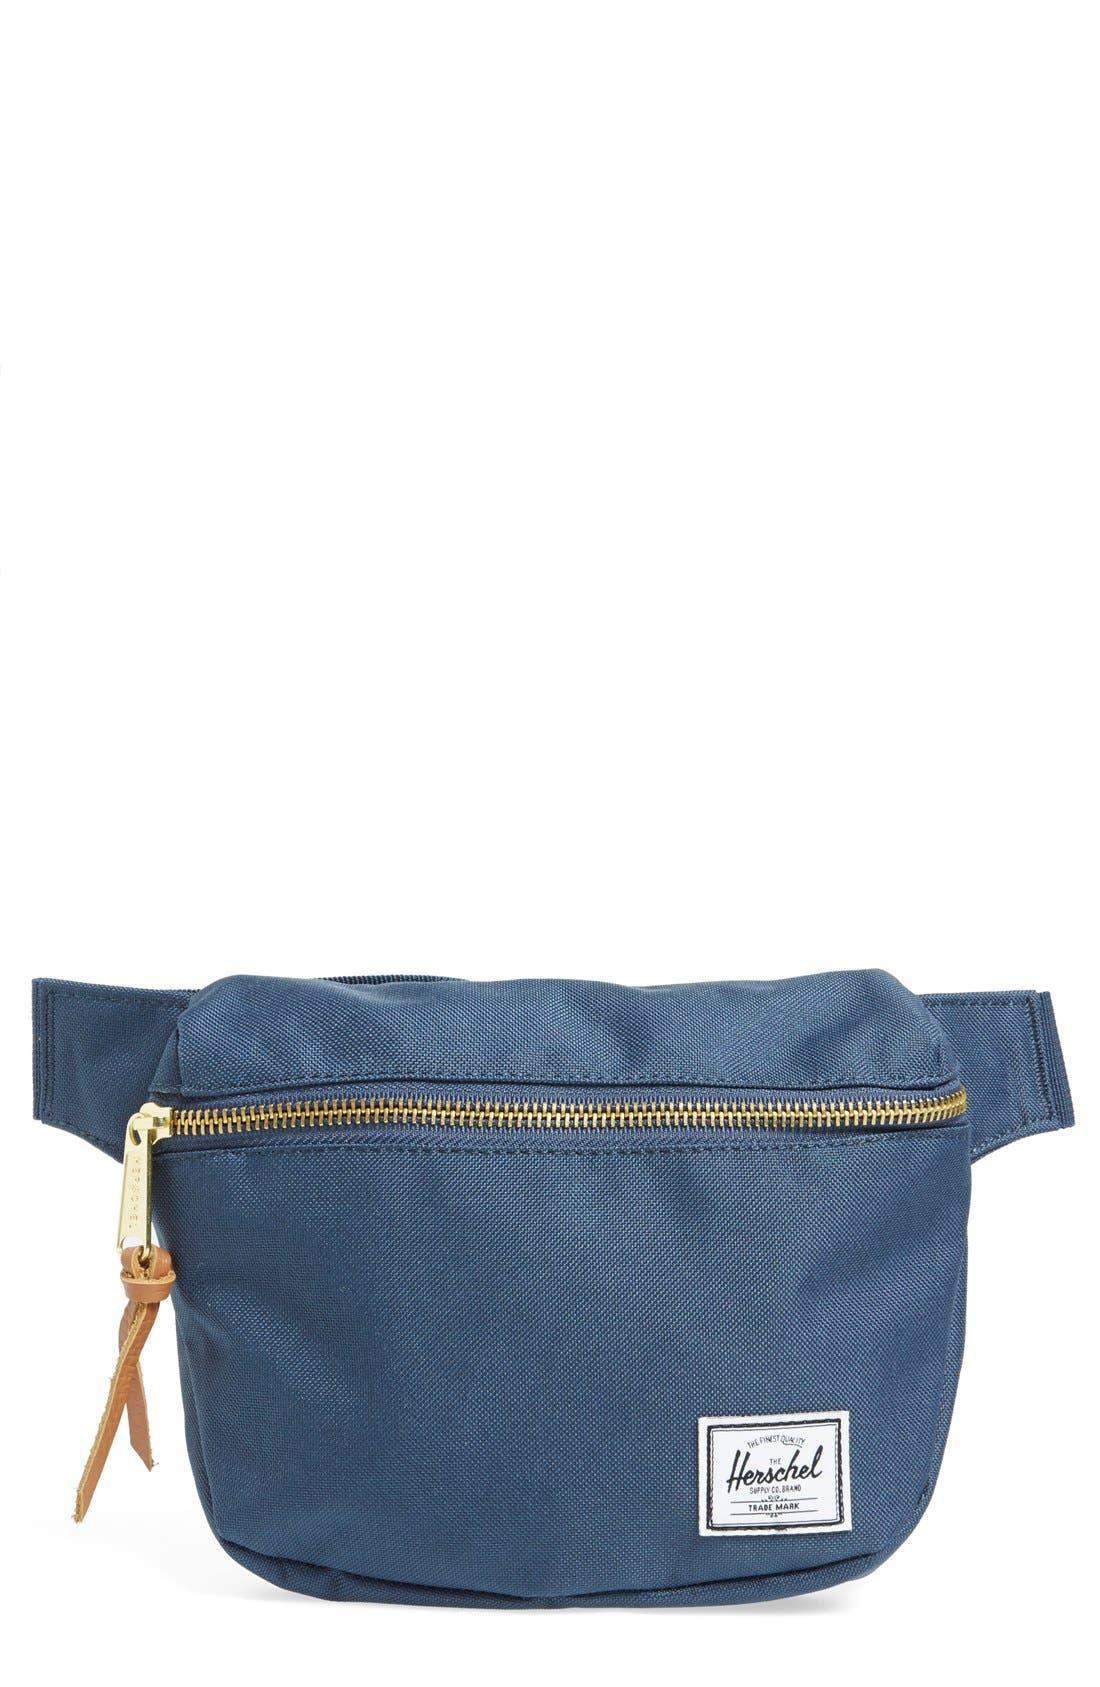 Alternate Image 1 Selected - Herschel Supply Co. Fifteen Belt Bag